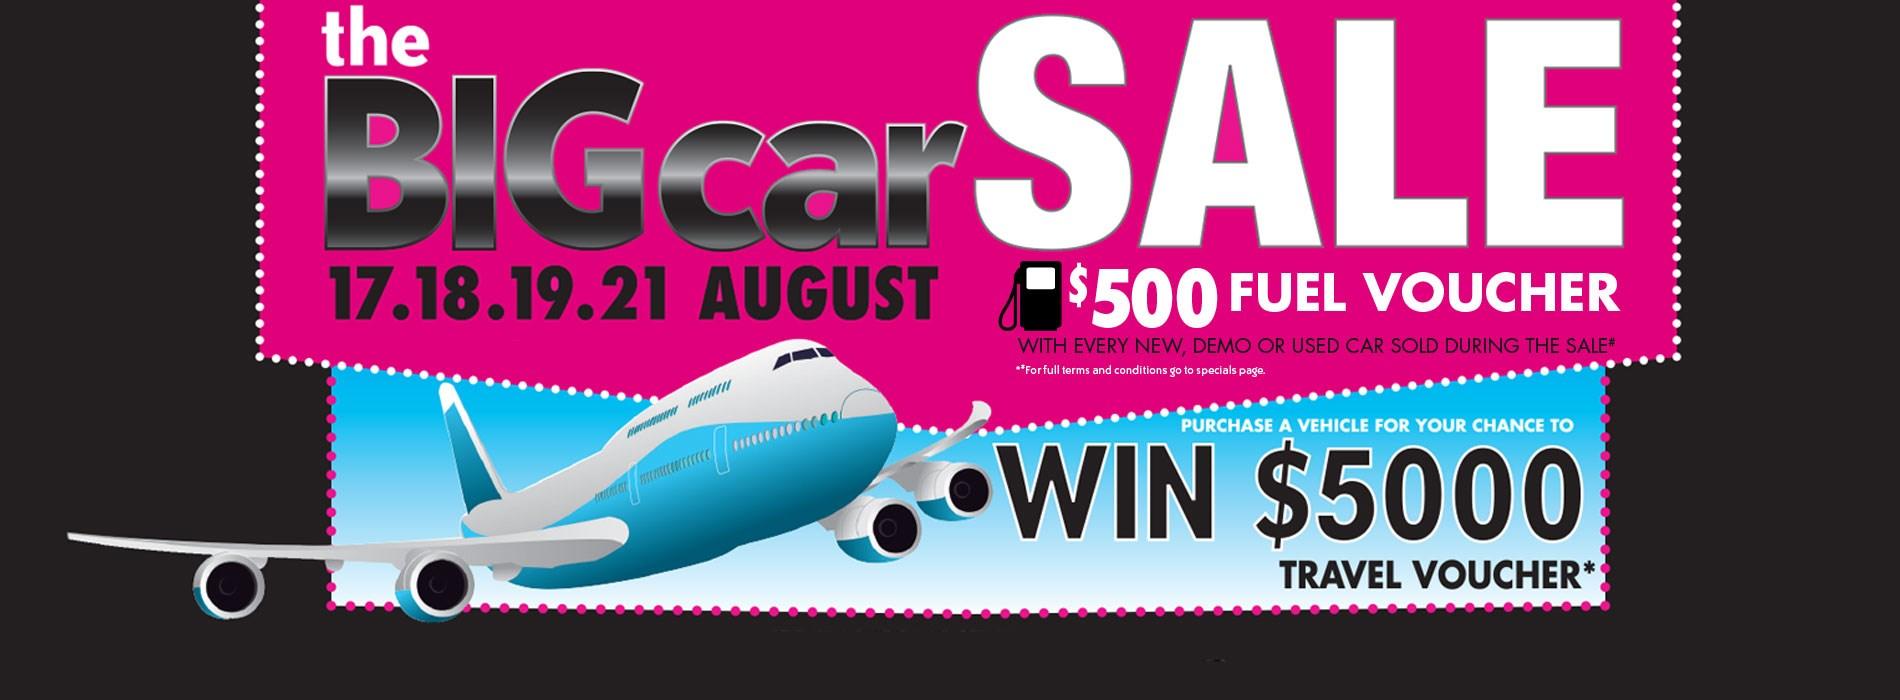 Big Car Sale Event Adrian Brian Jeep Fiat